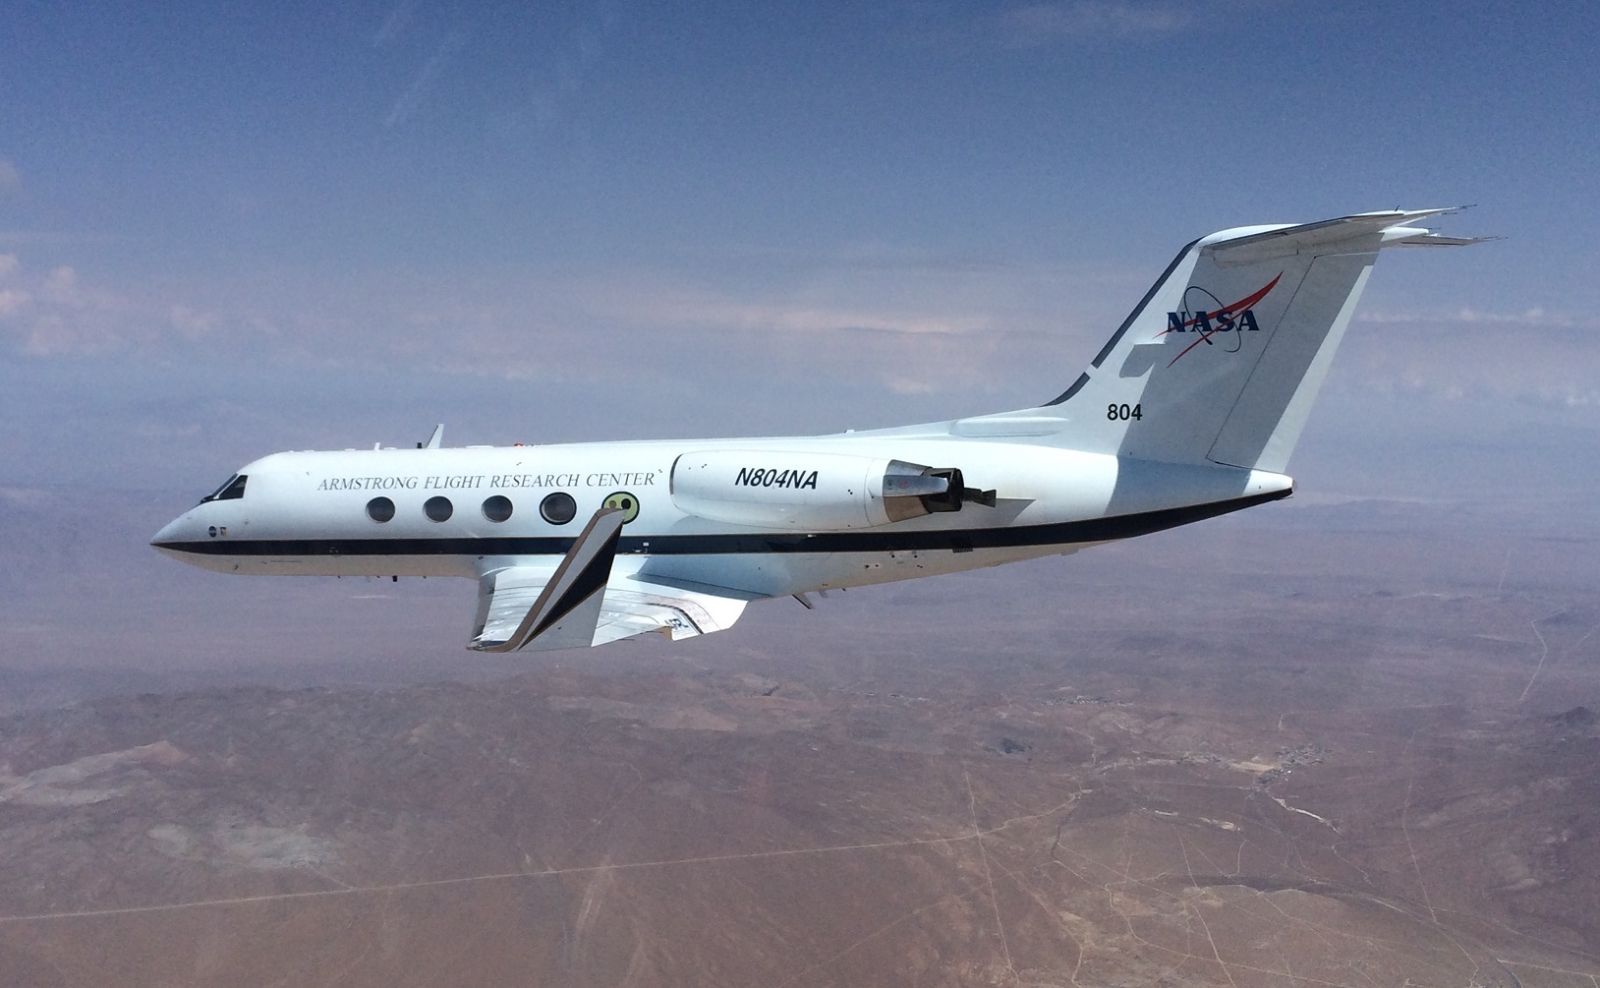 NASA shape changing wings ACTE